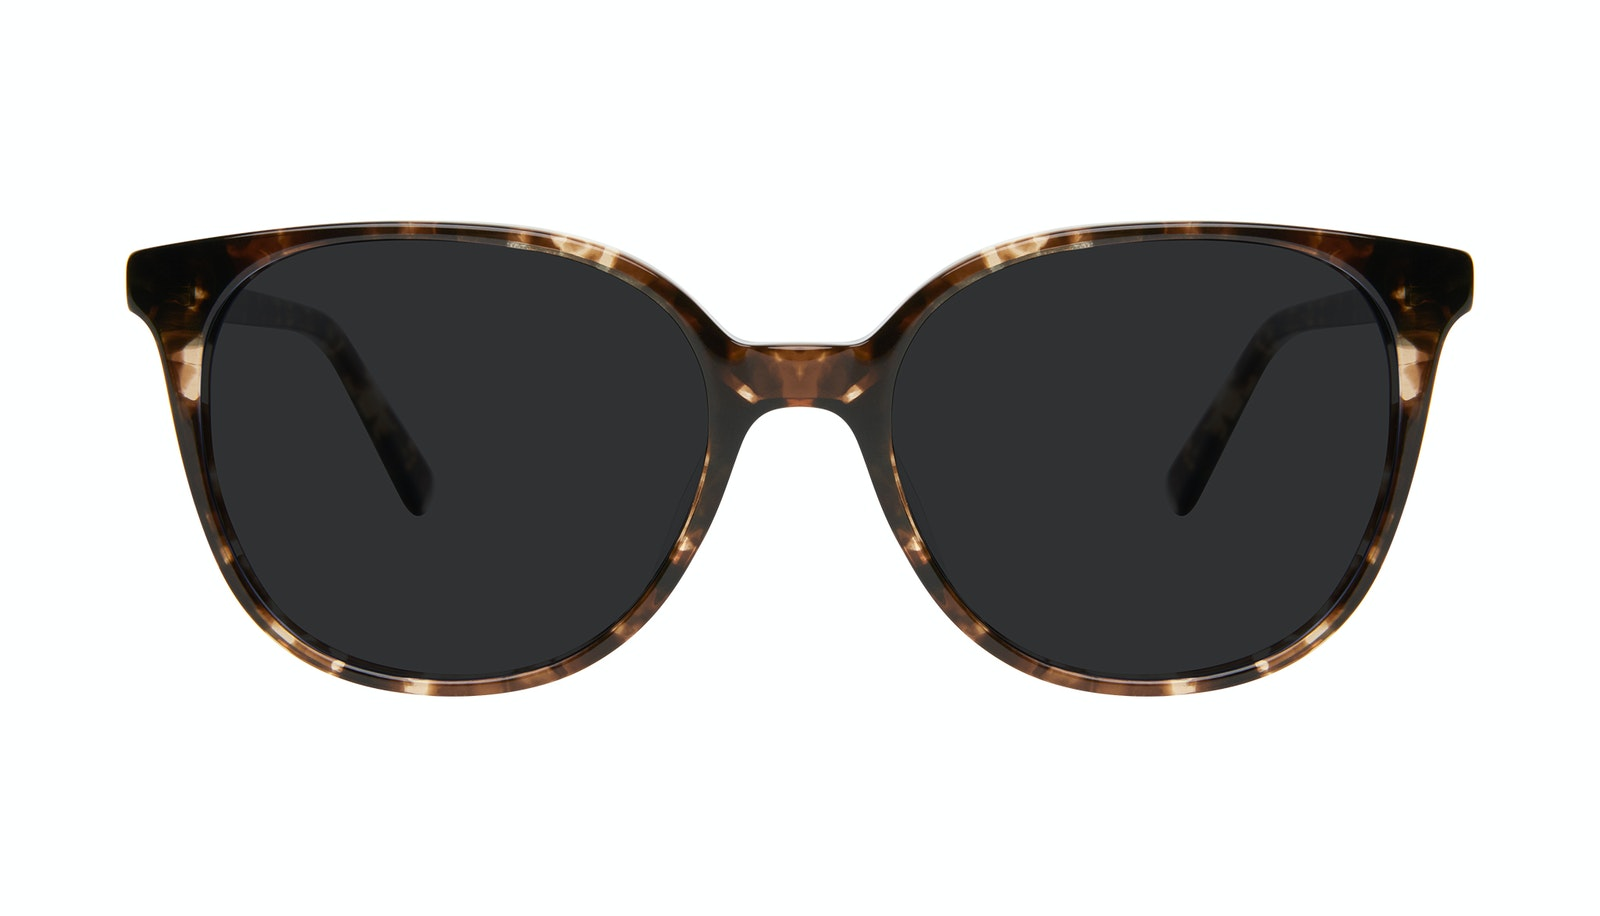 Affordable Fashion Glasses Square Sunglasses Women Novel Leopard